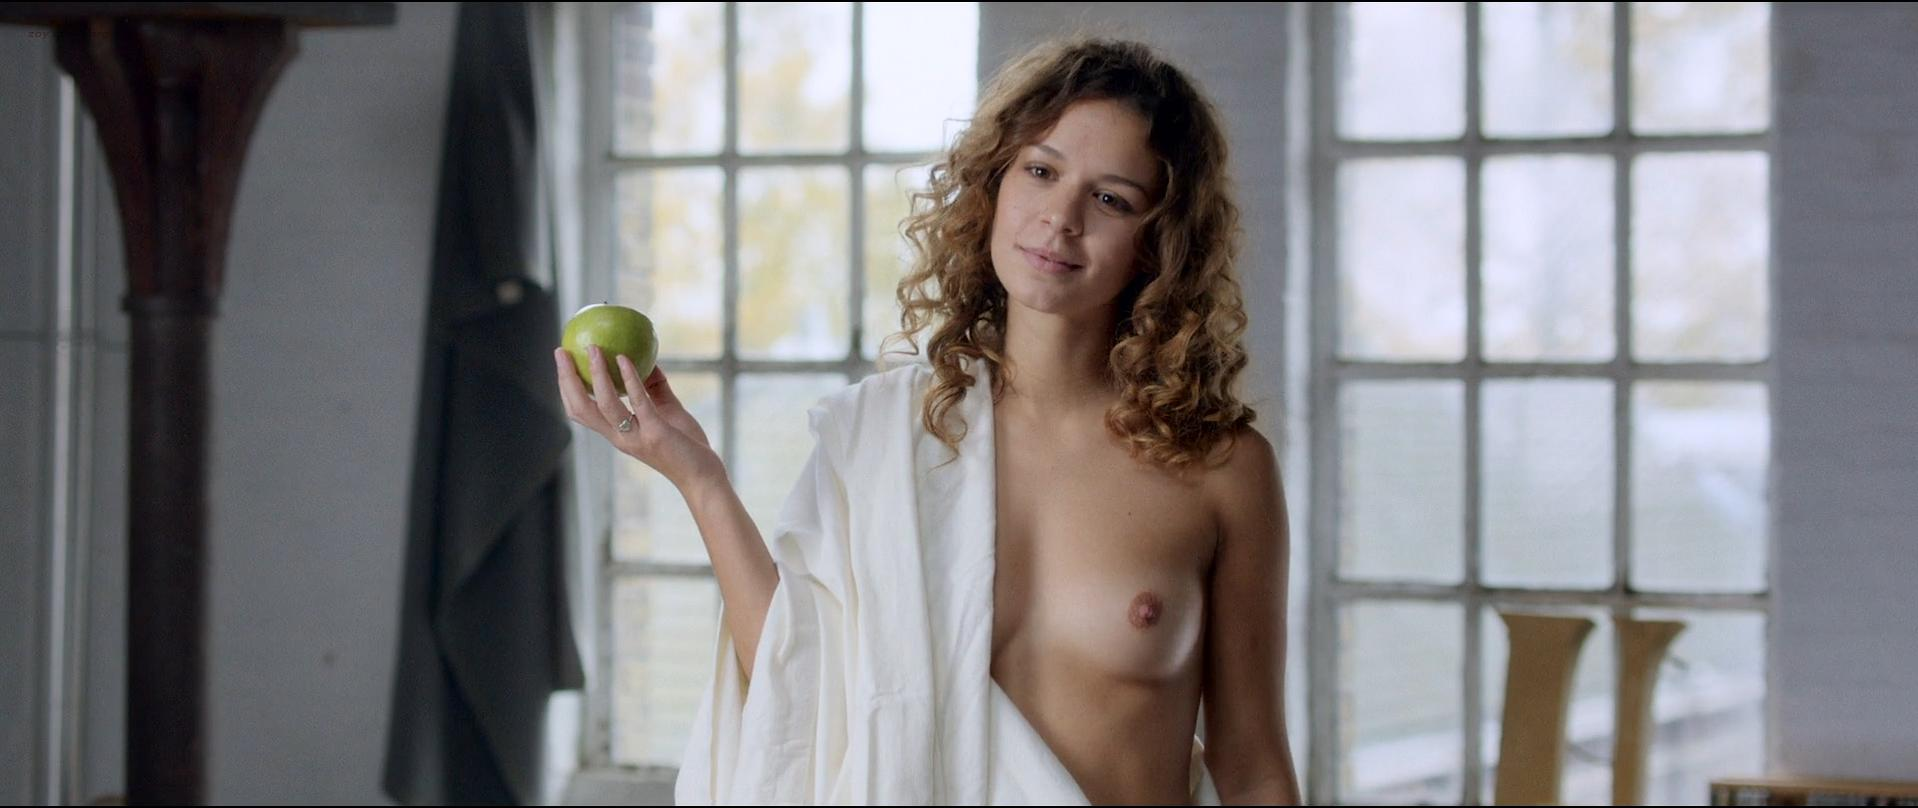 Anouk Kleykamp nude, Jelka van Houten sexy - Familieweekend (2016)